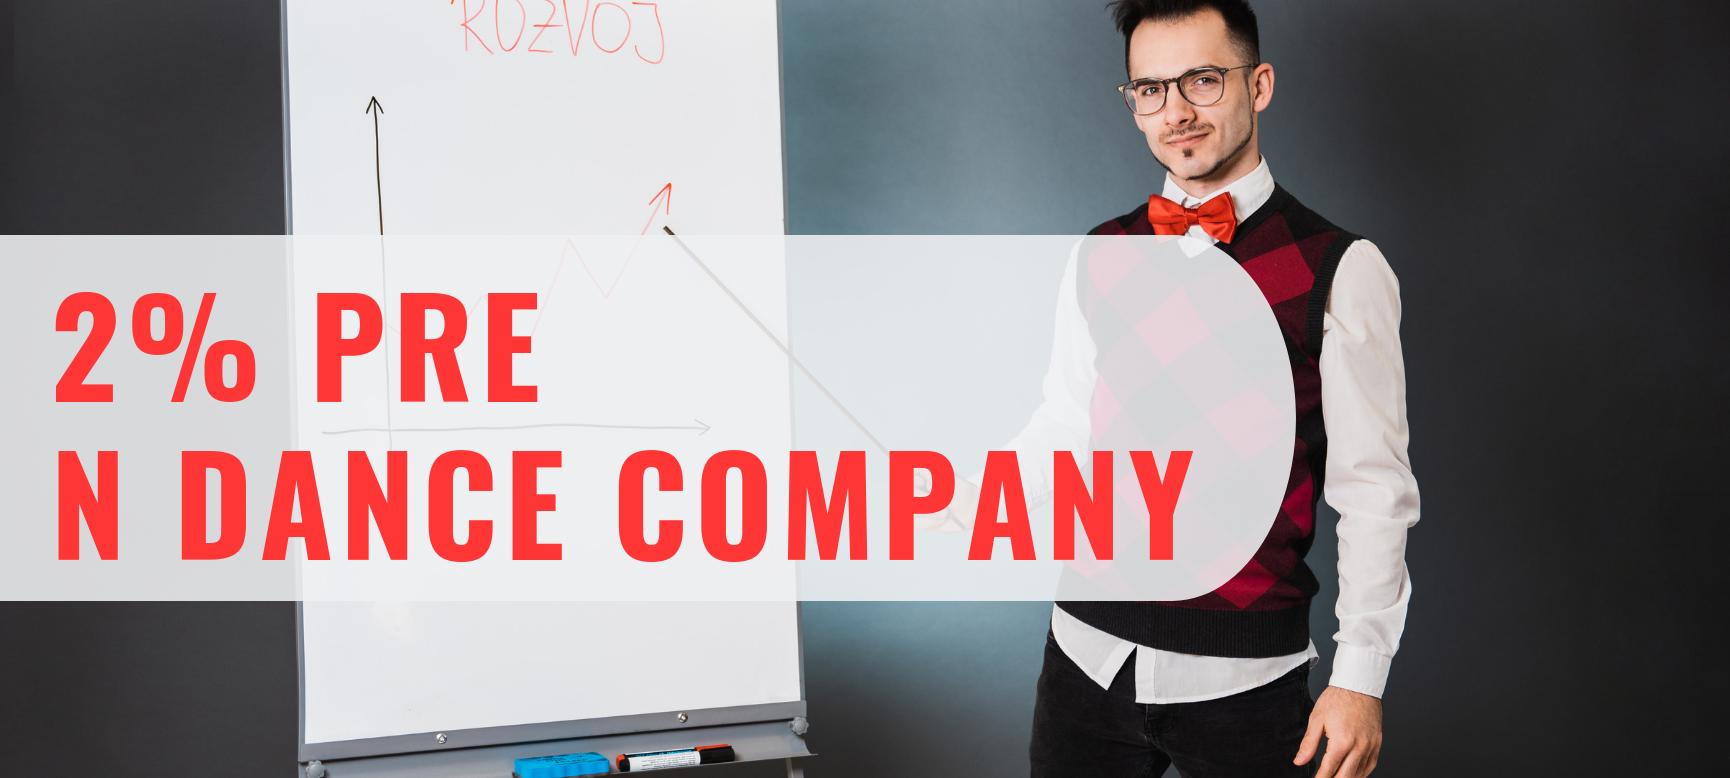 2-PRE-N-DANCE-COMPANY-banner-web